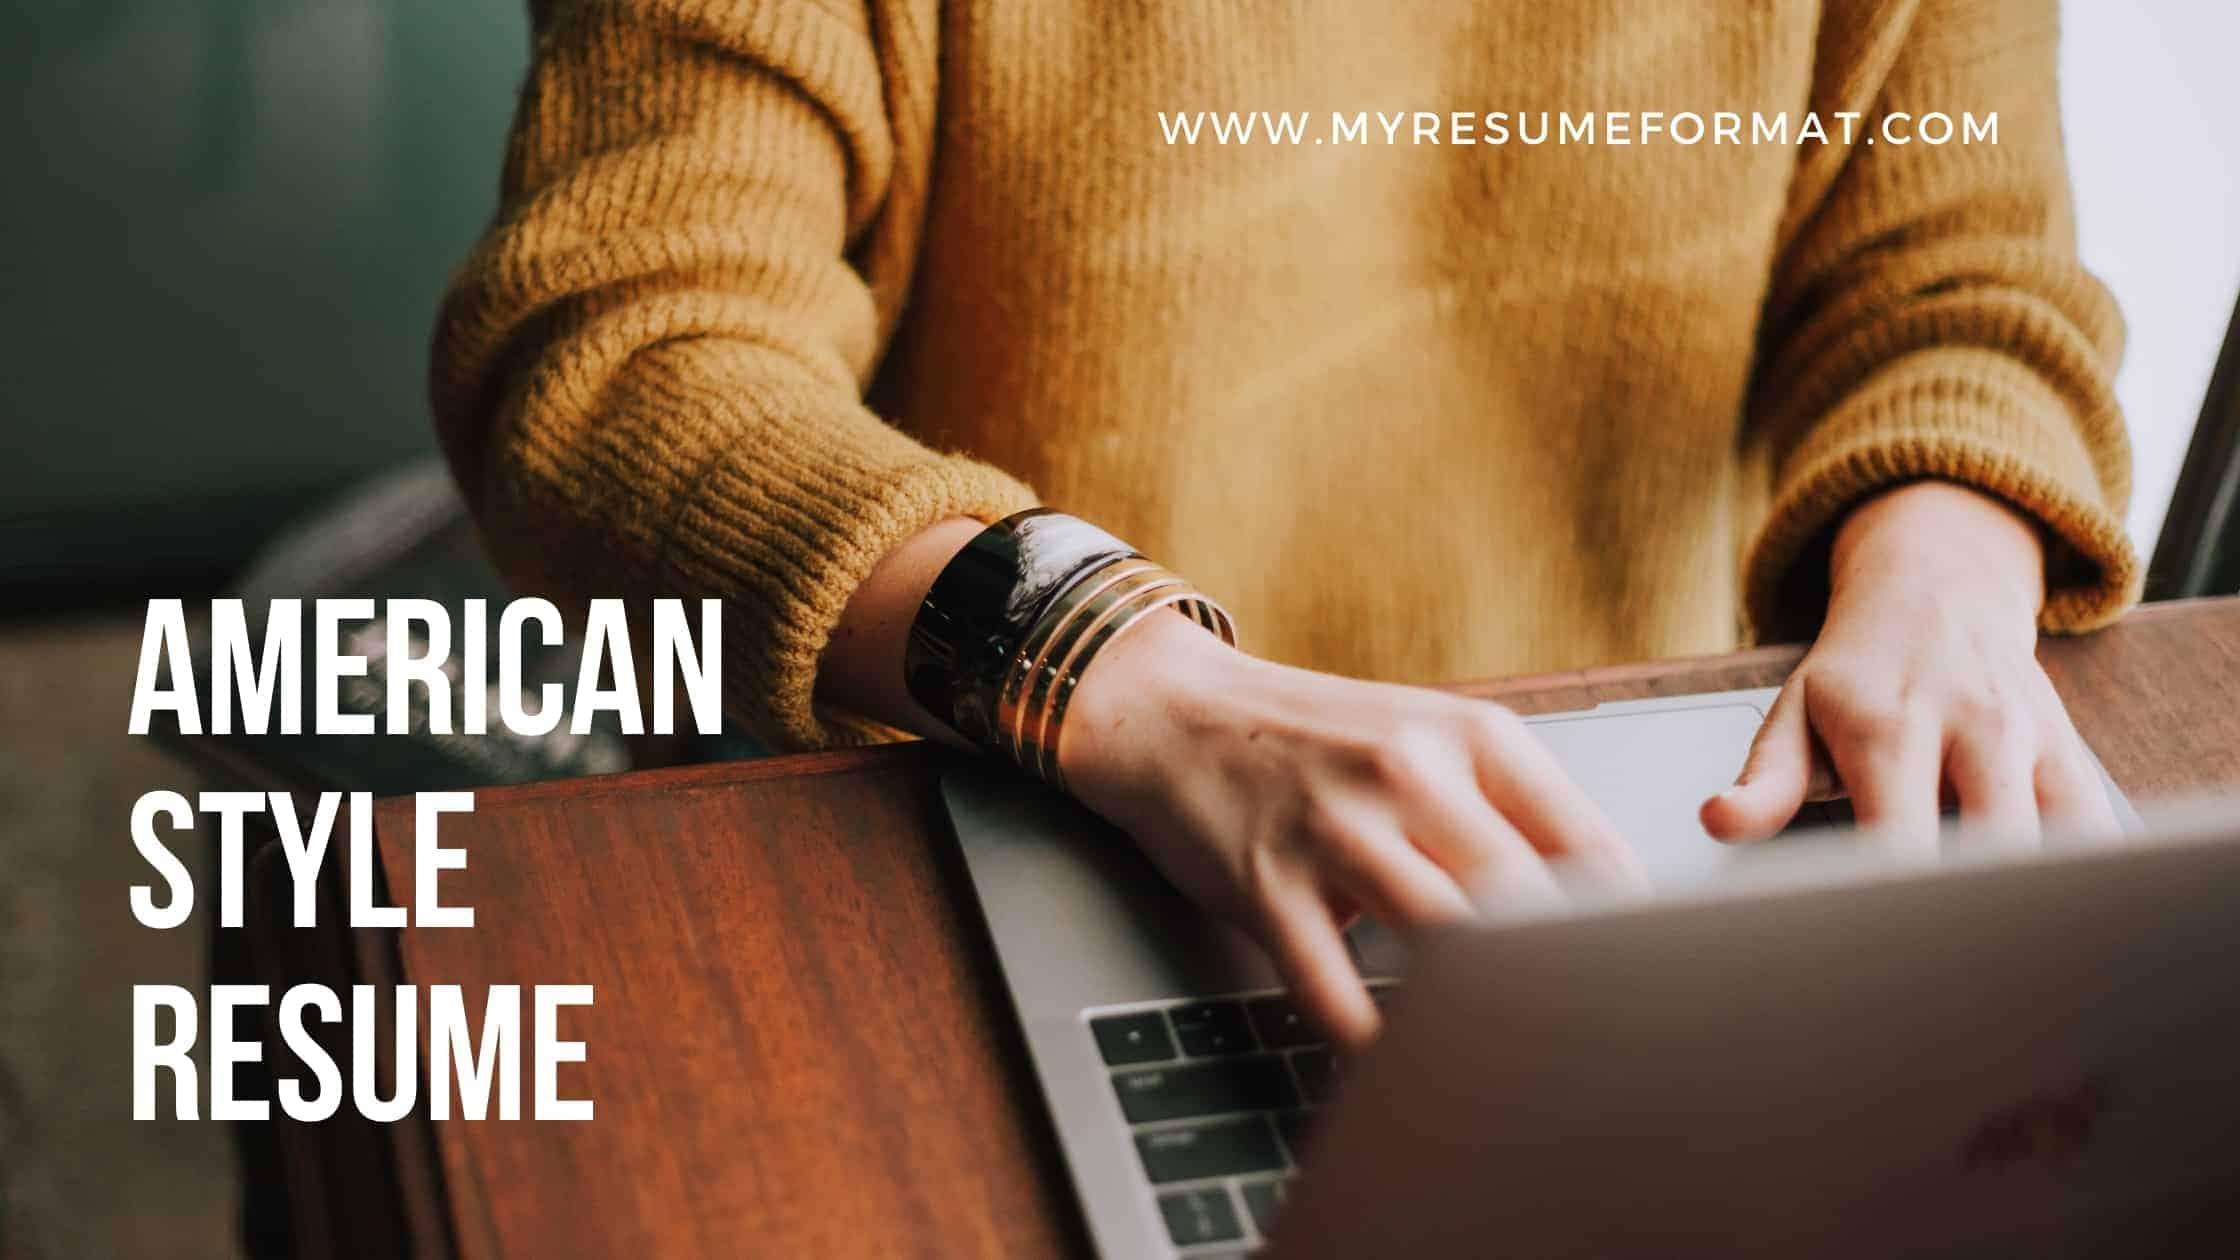 American resume template